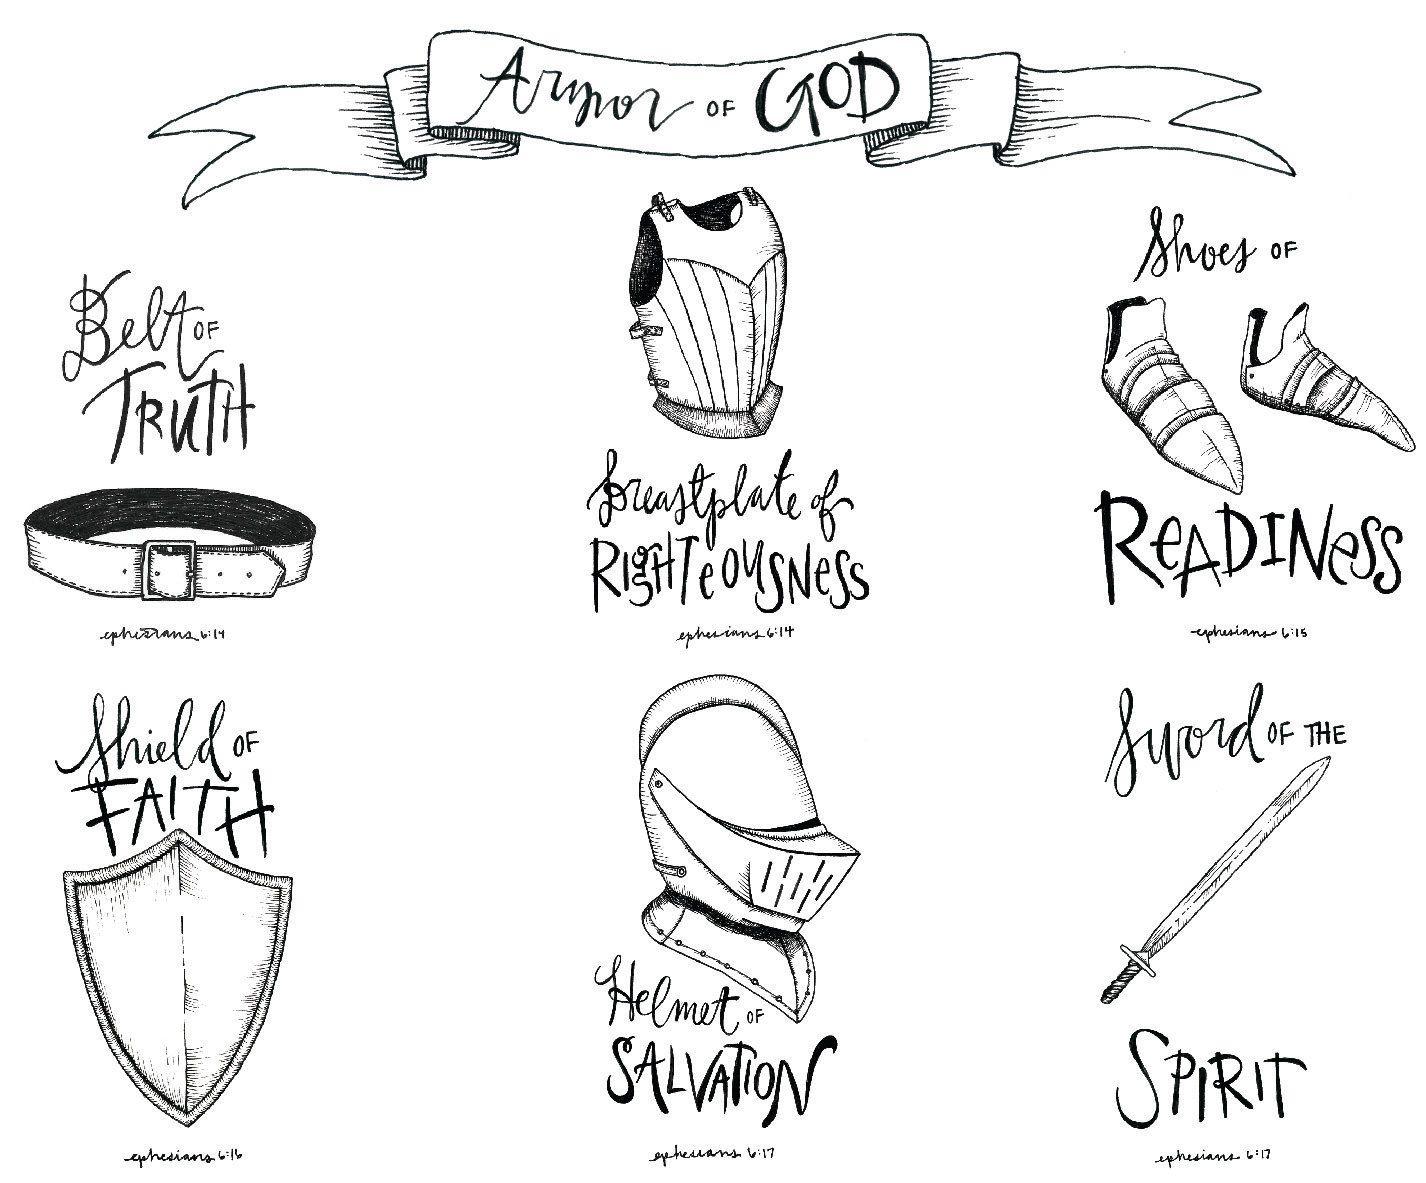 Workbooks god and family student workbook pdf : Image result for armor of god | Living Word | Pinterest | Worship ...